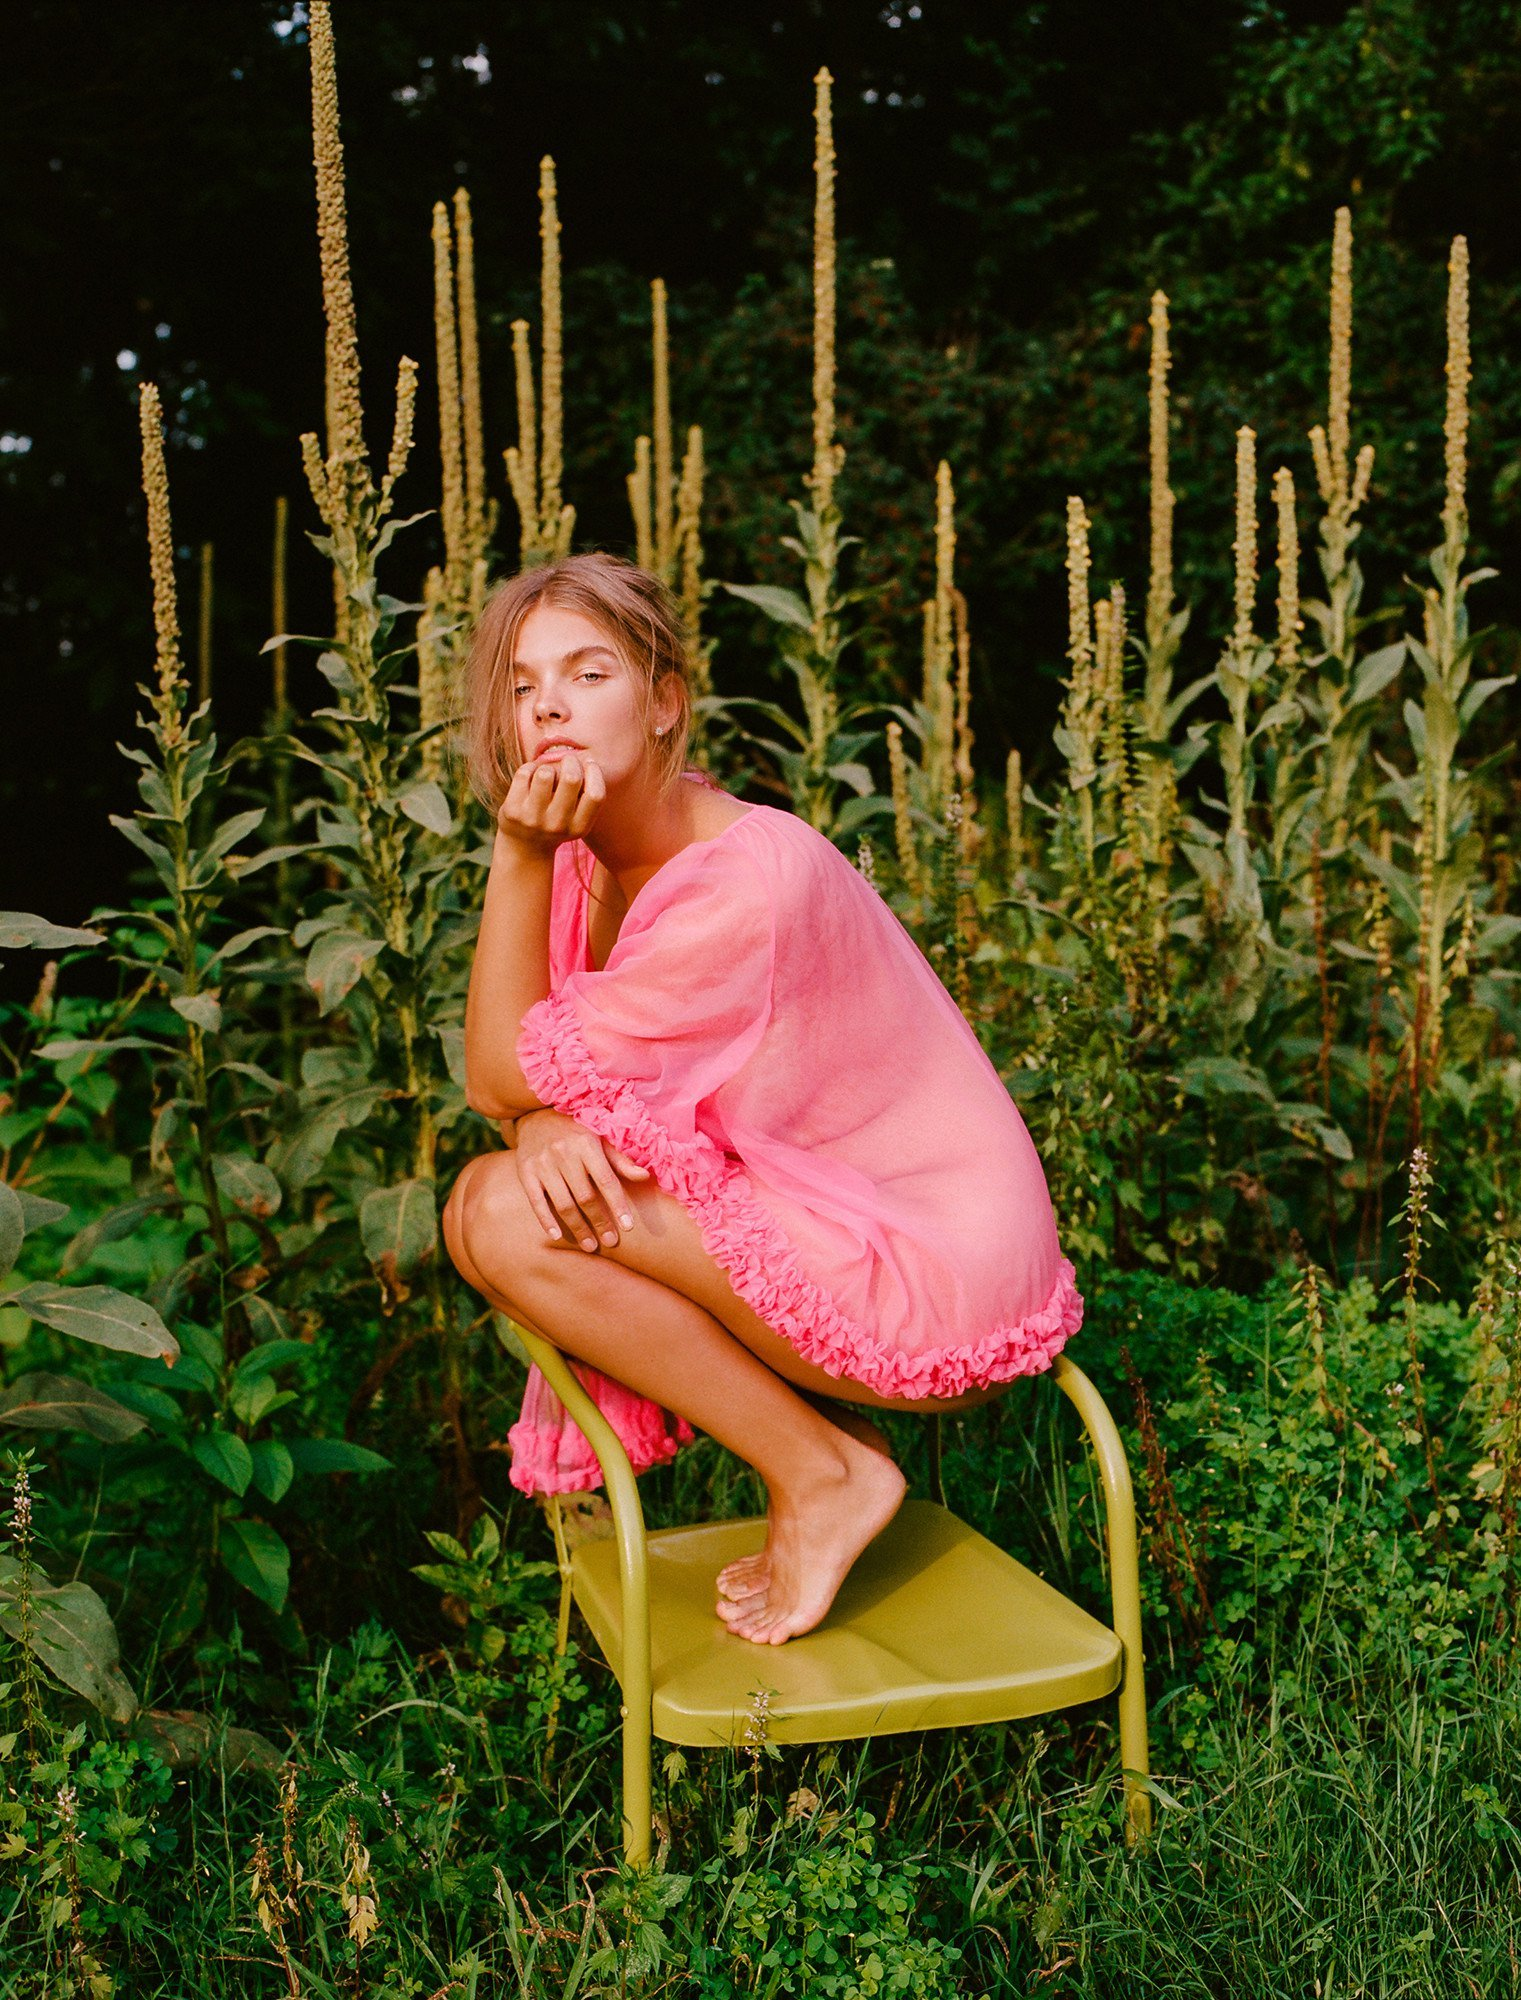 Feet Christine Sofie Johansen naked (74 foto and video), Pussy, Hot, Feet, underwear 2015